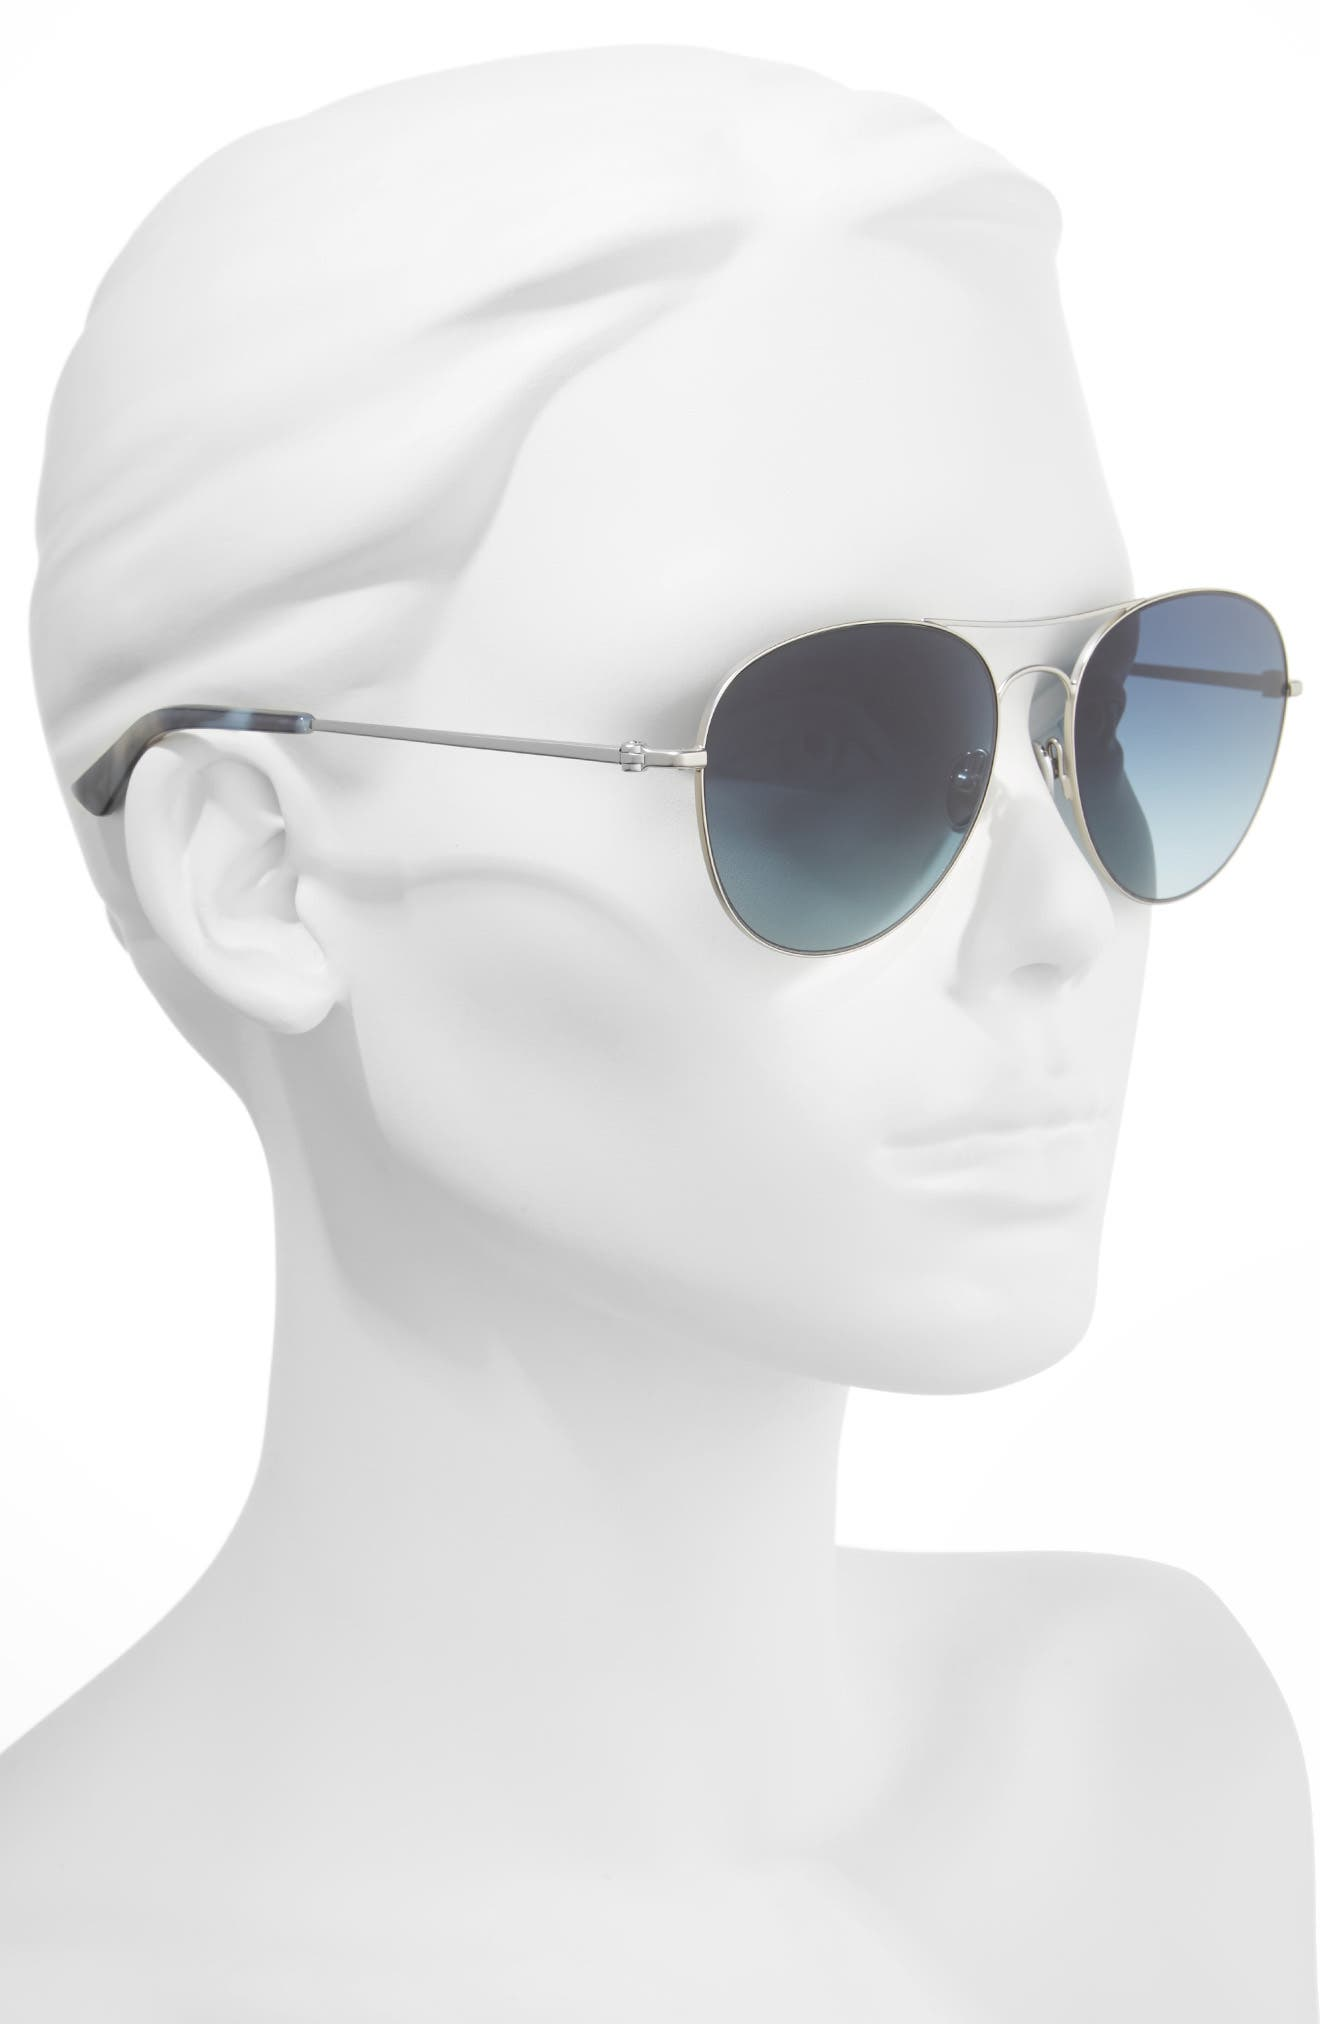 57mm Aviator Sunglasses,                             Alternate thumbnail 2, color,                             Satin Nickel